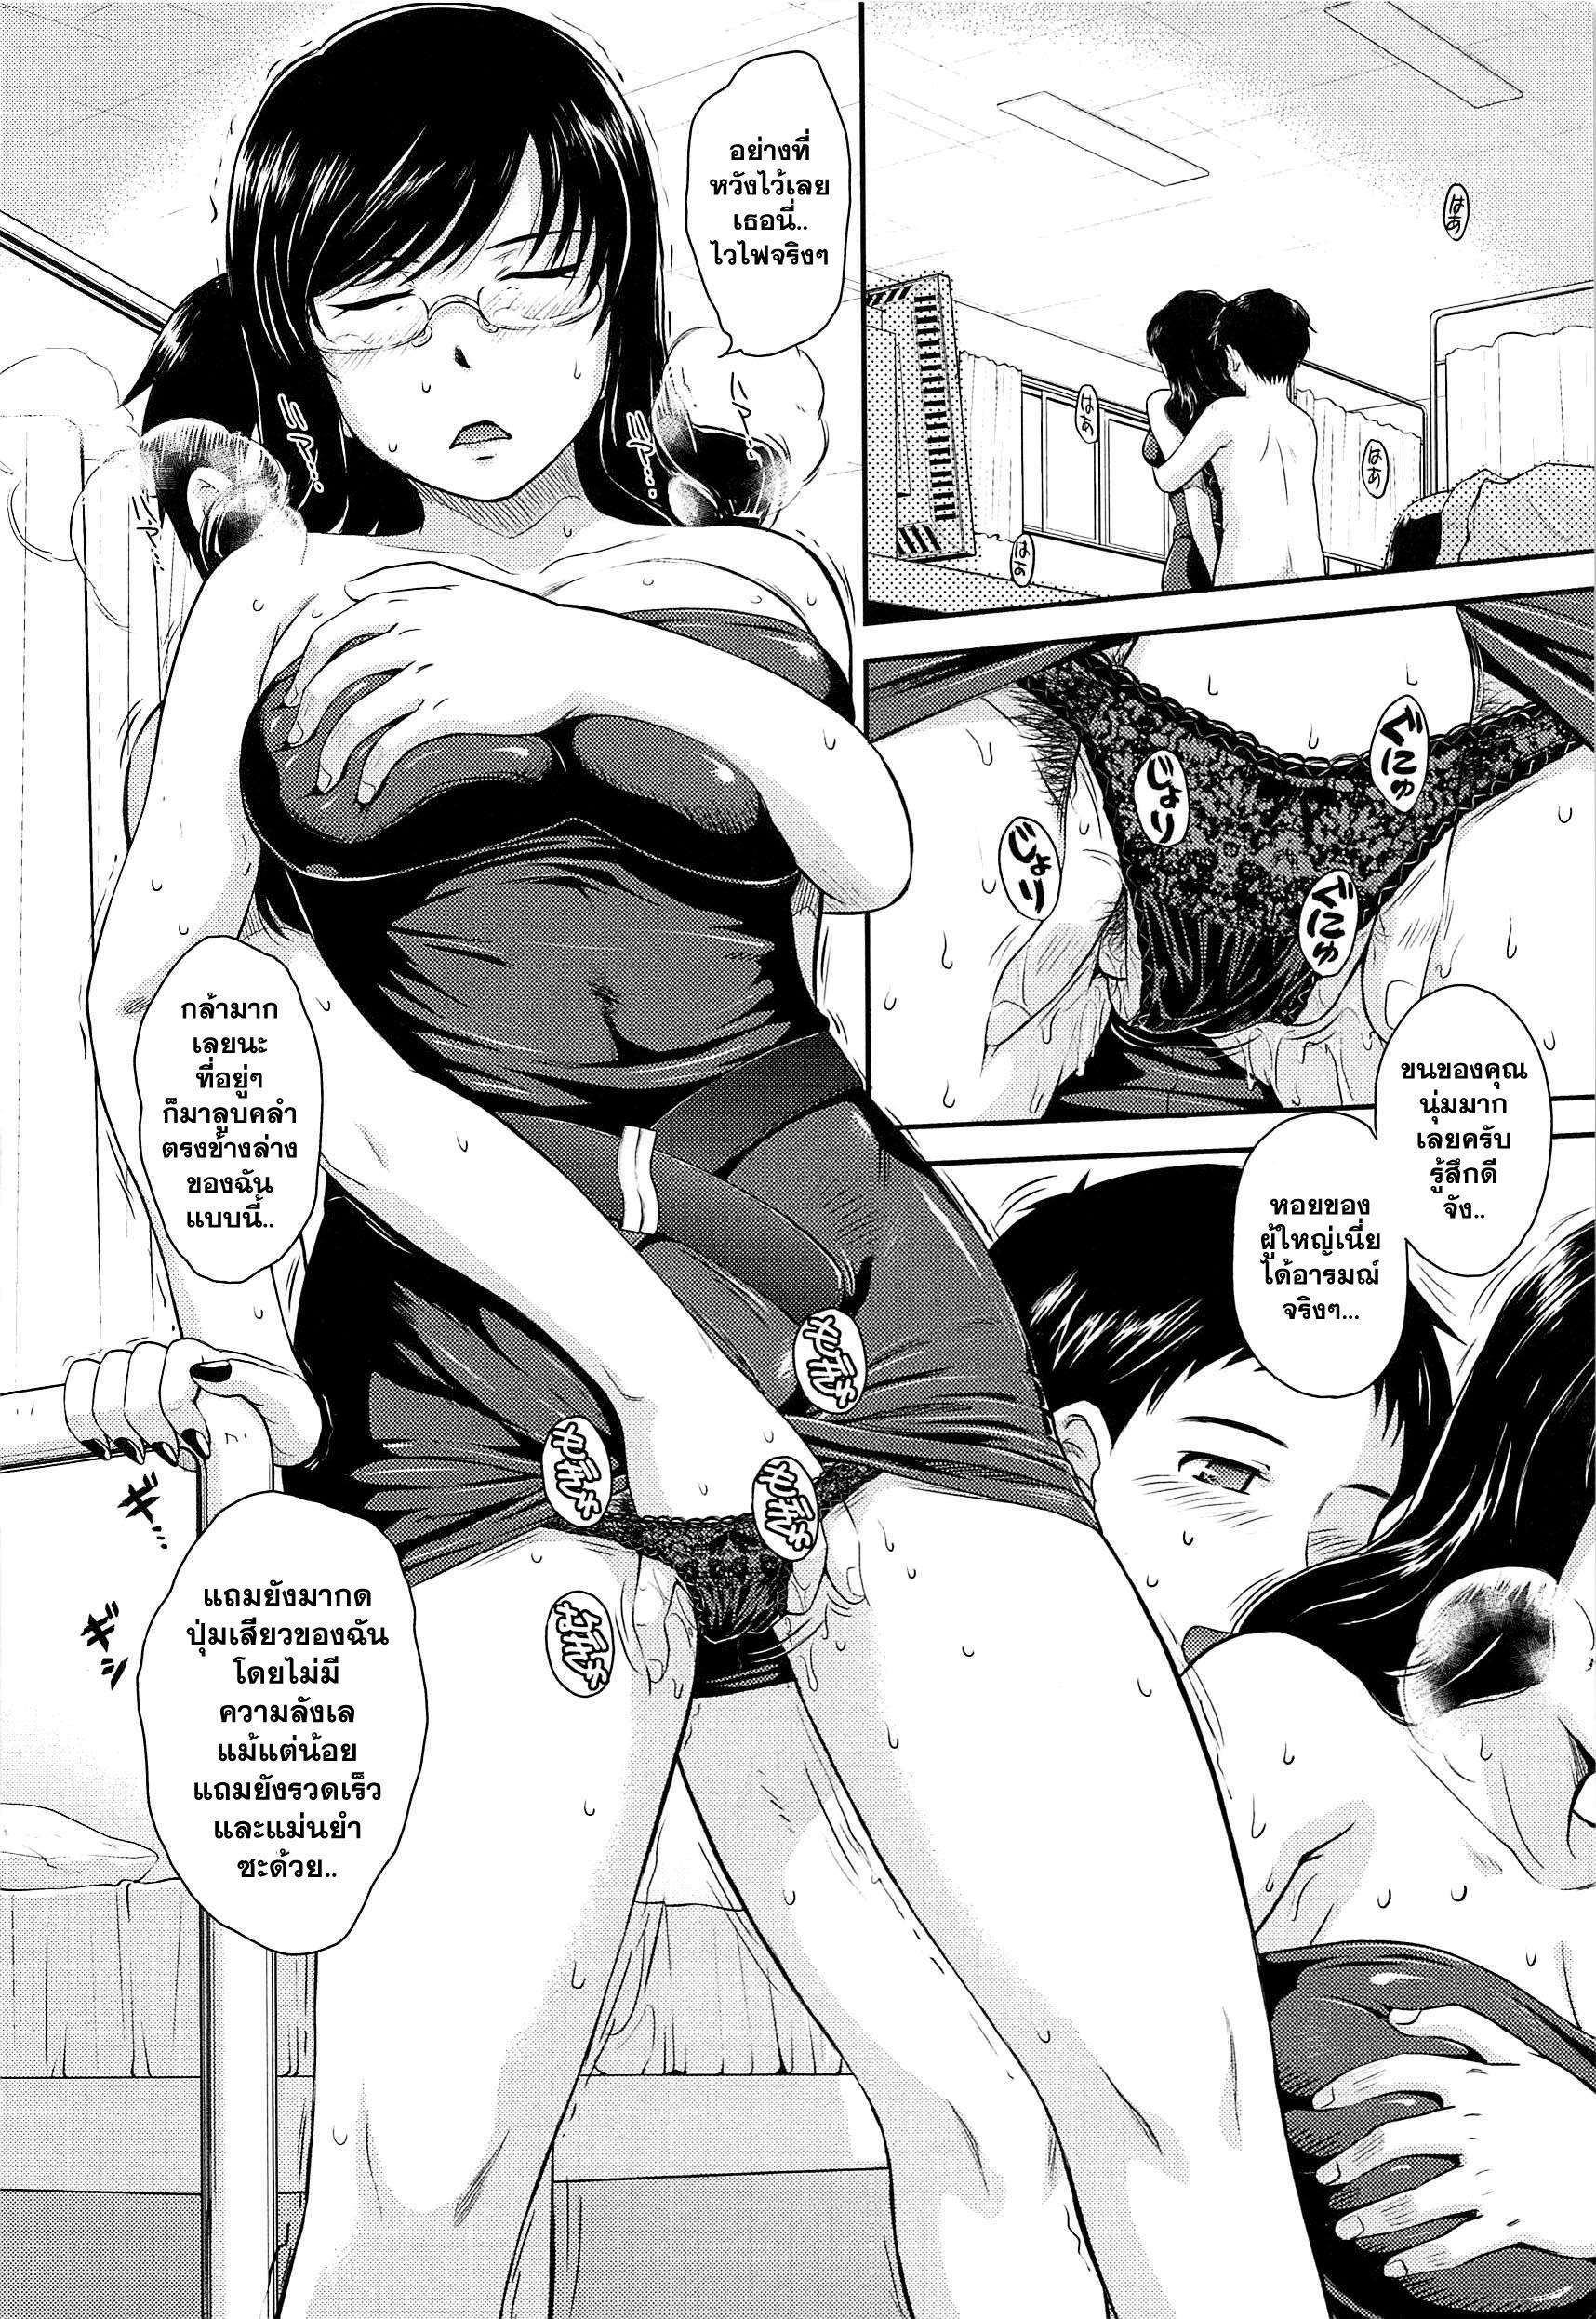 =Catarock= | การ์ตูน Doujin Manga แปลไทยล้วนๆ  XONLY4